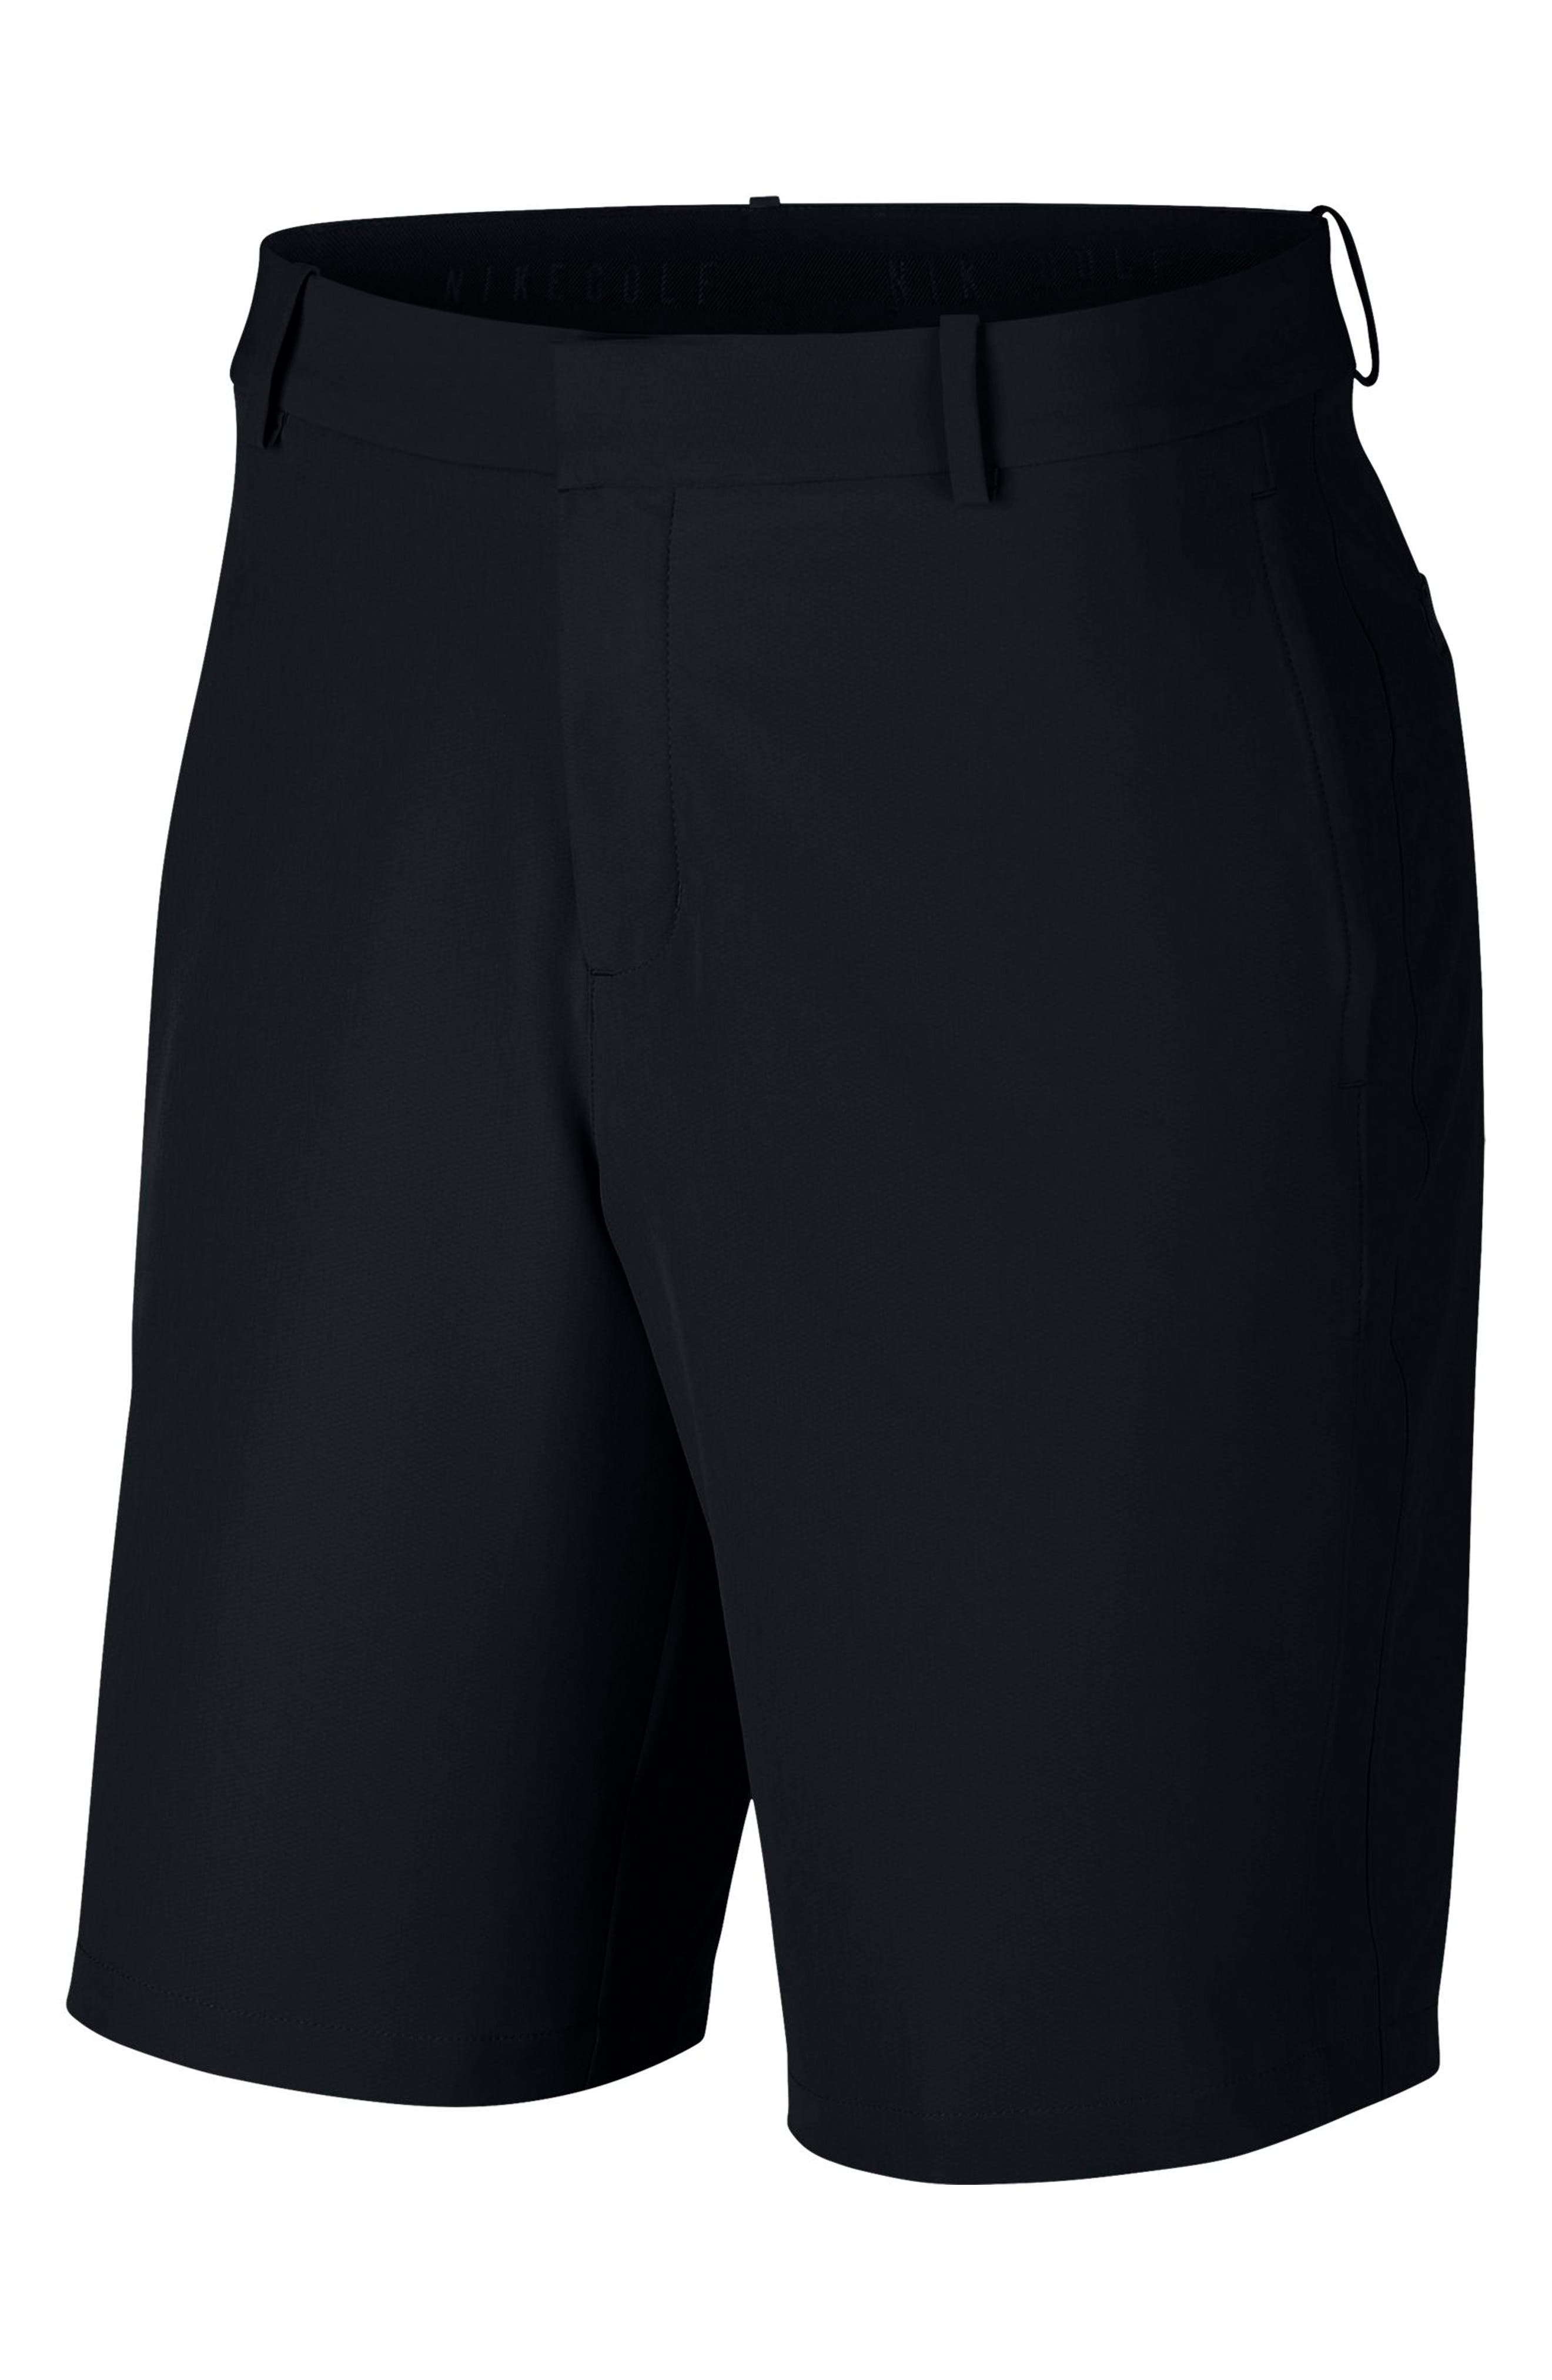 Flex Hybrid Standard Fit Golf Shorts,                             Alternate thumbnail 4, color,                             BLACK/ BLACK